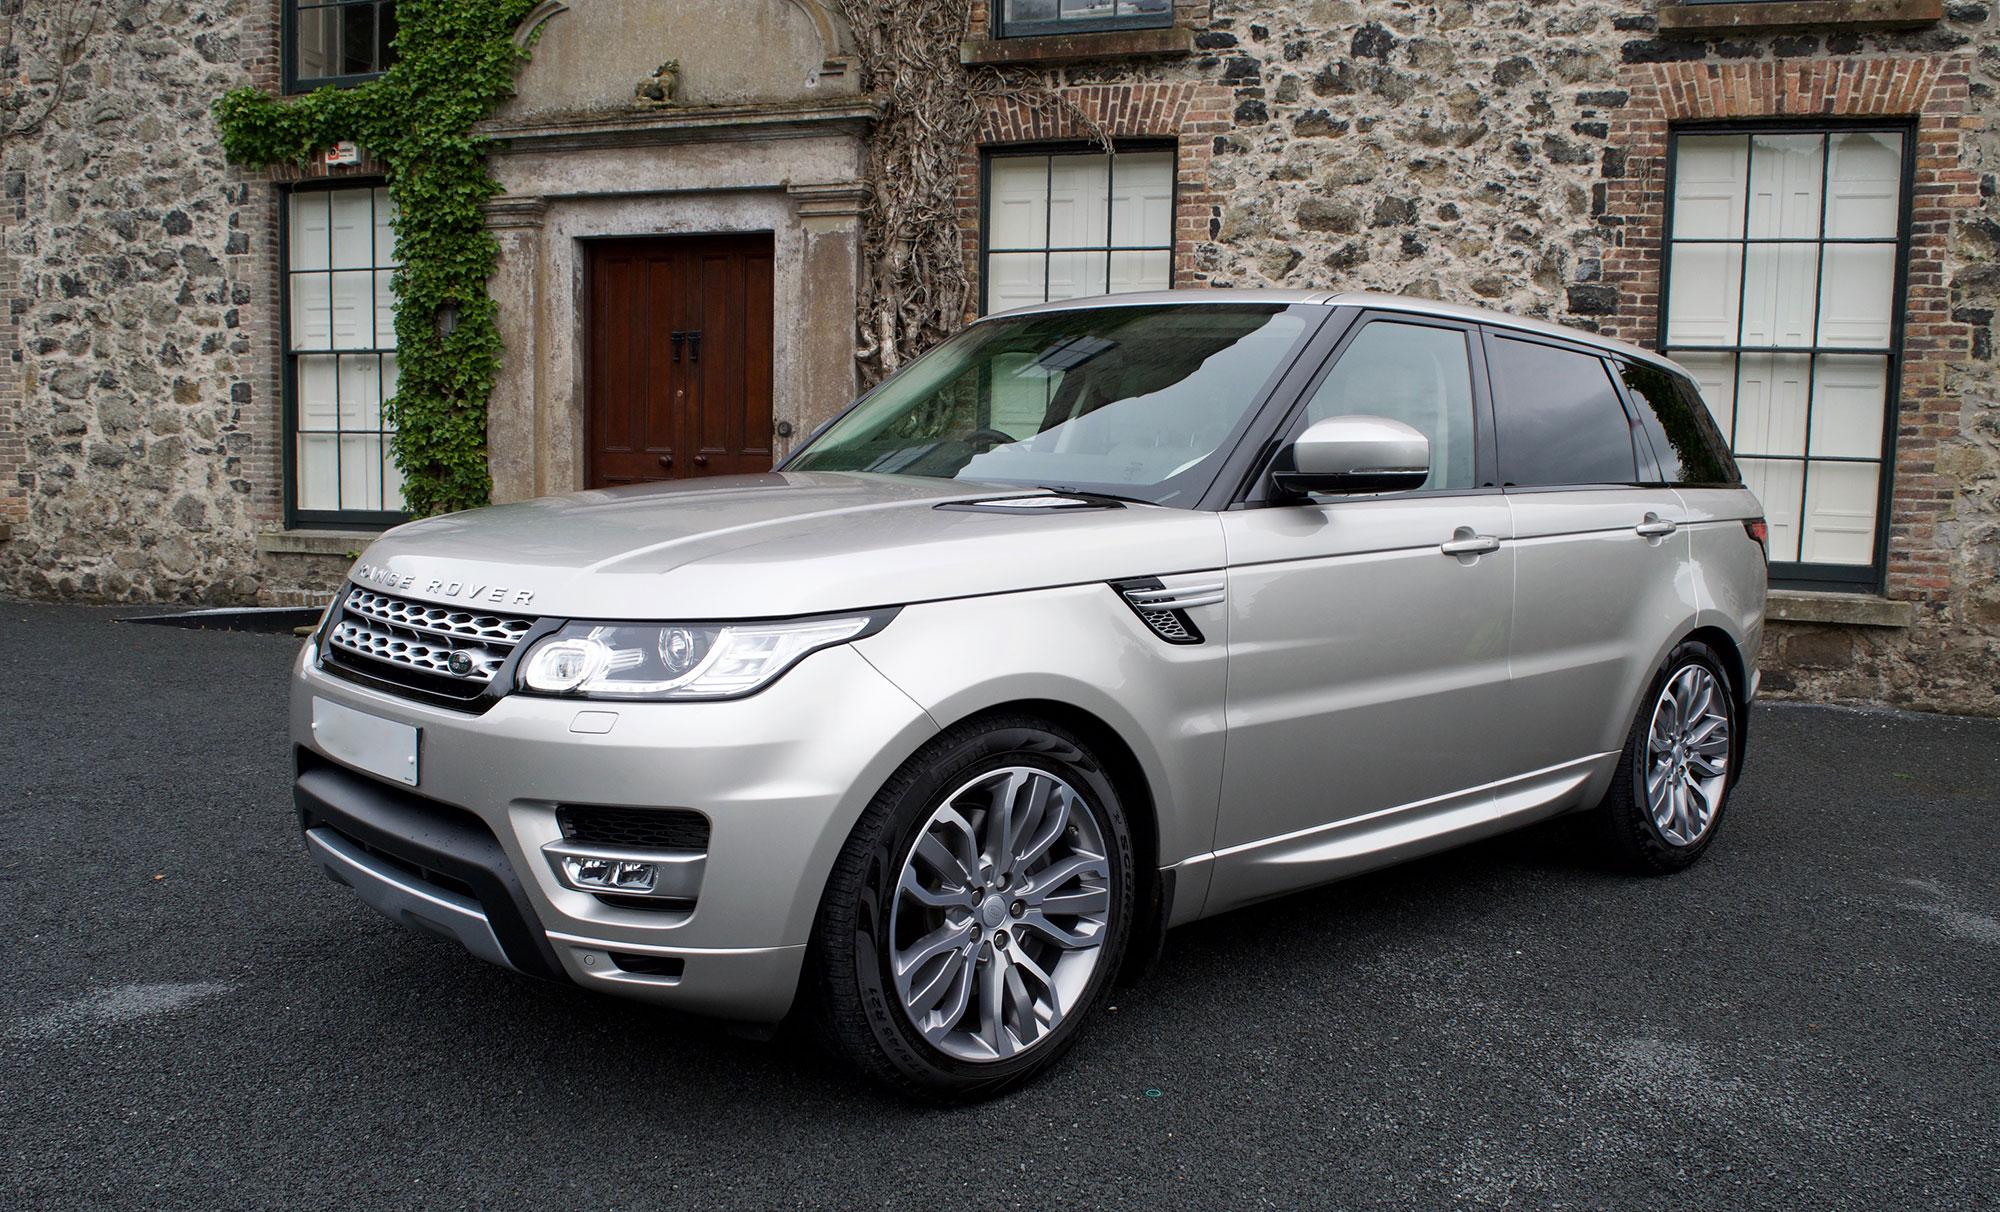 2016 Range Rover Sport 3.0D HSE